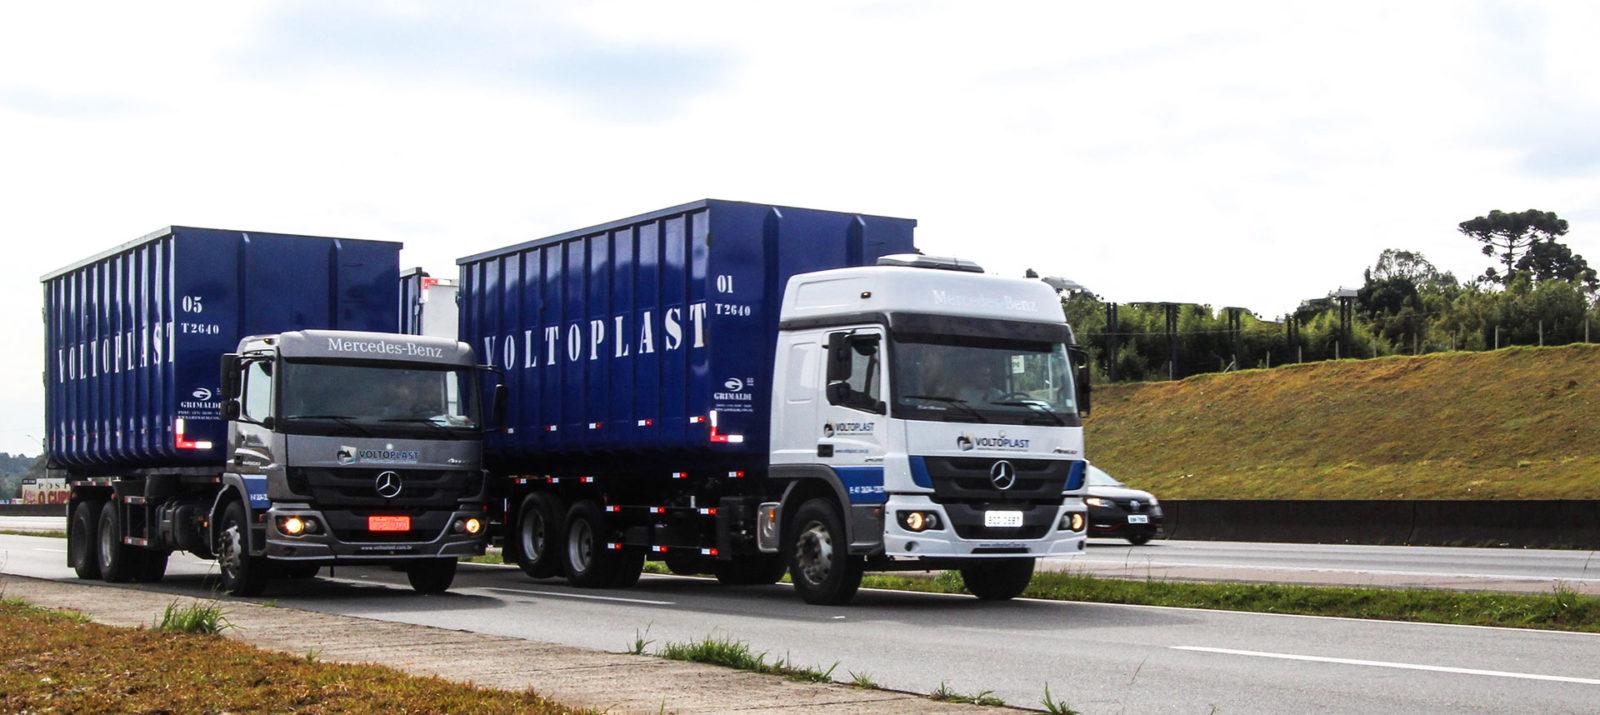 Voltoplast Reciclagem - LOGÍSTICA